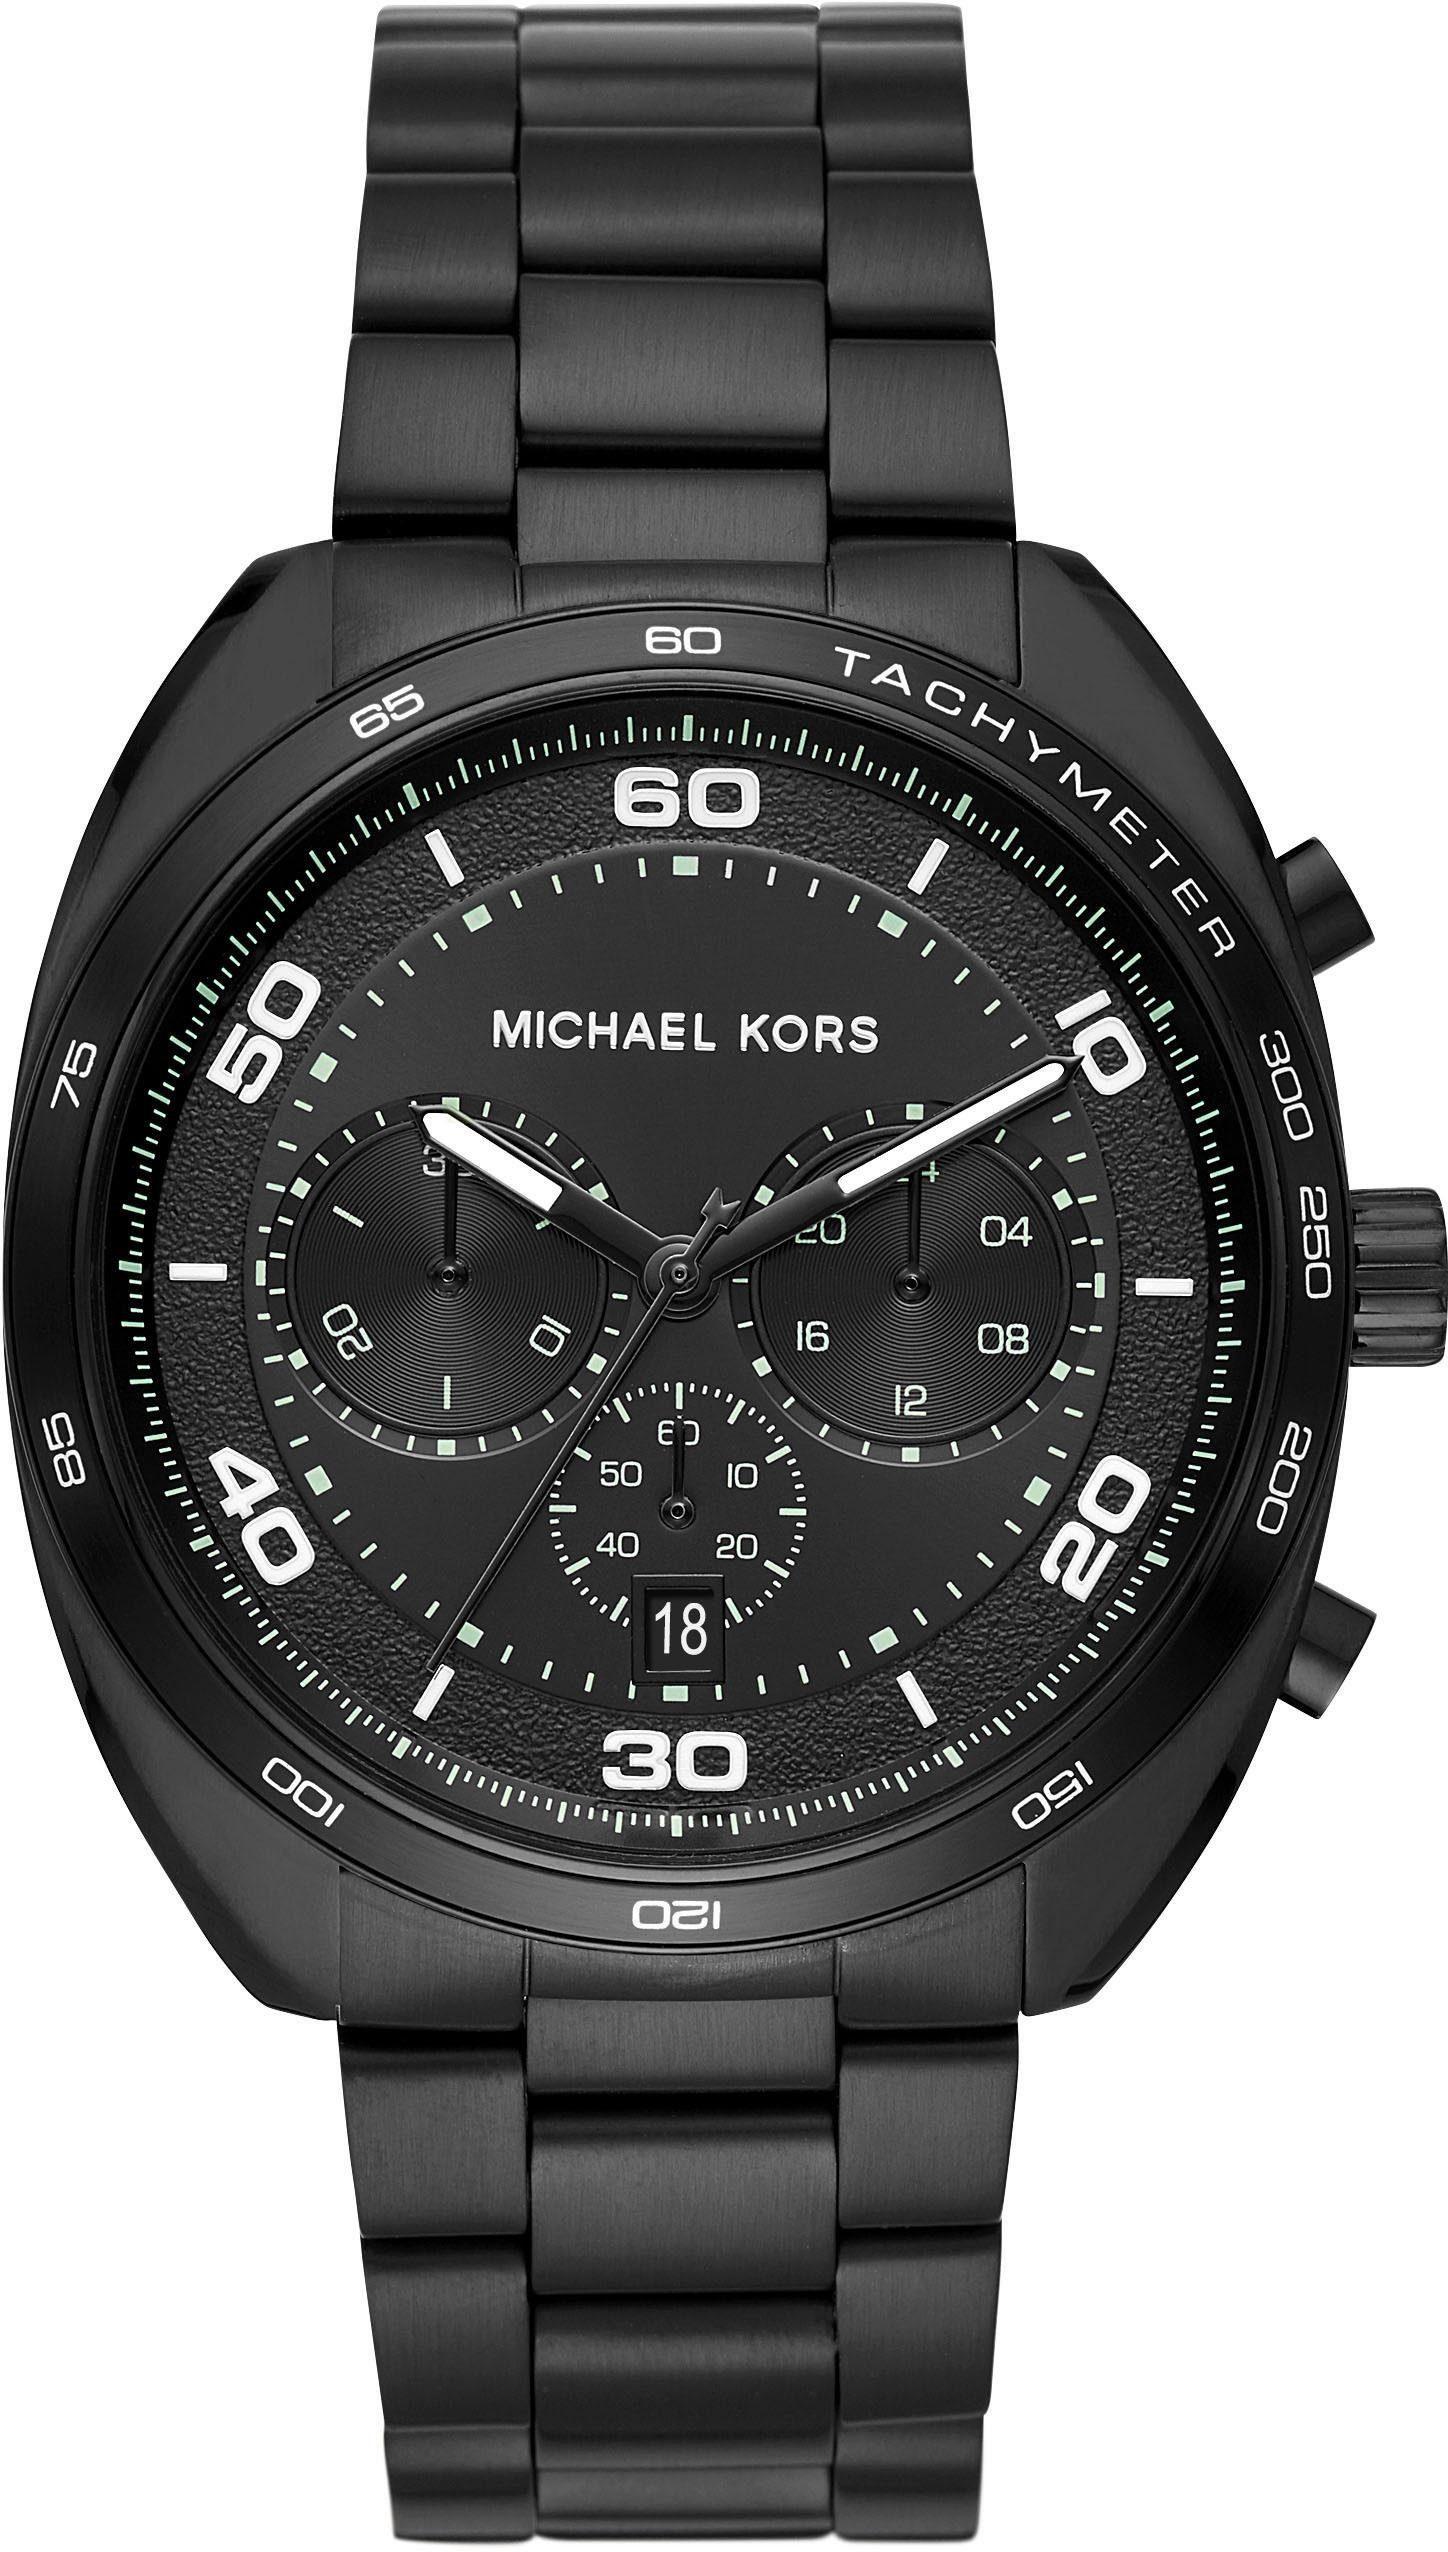 MICHAEL KORS Chronograph »DANE, MK8615«